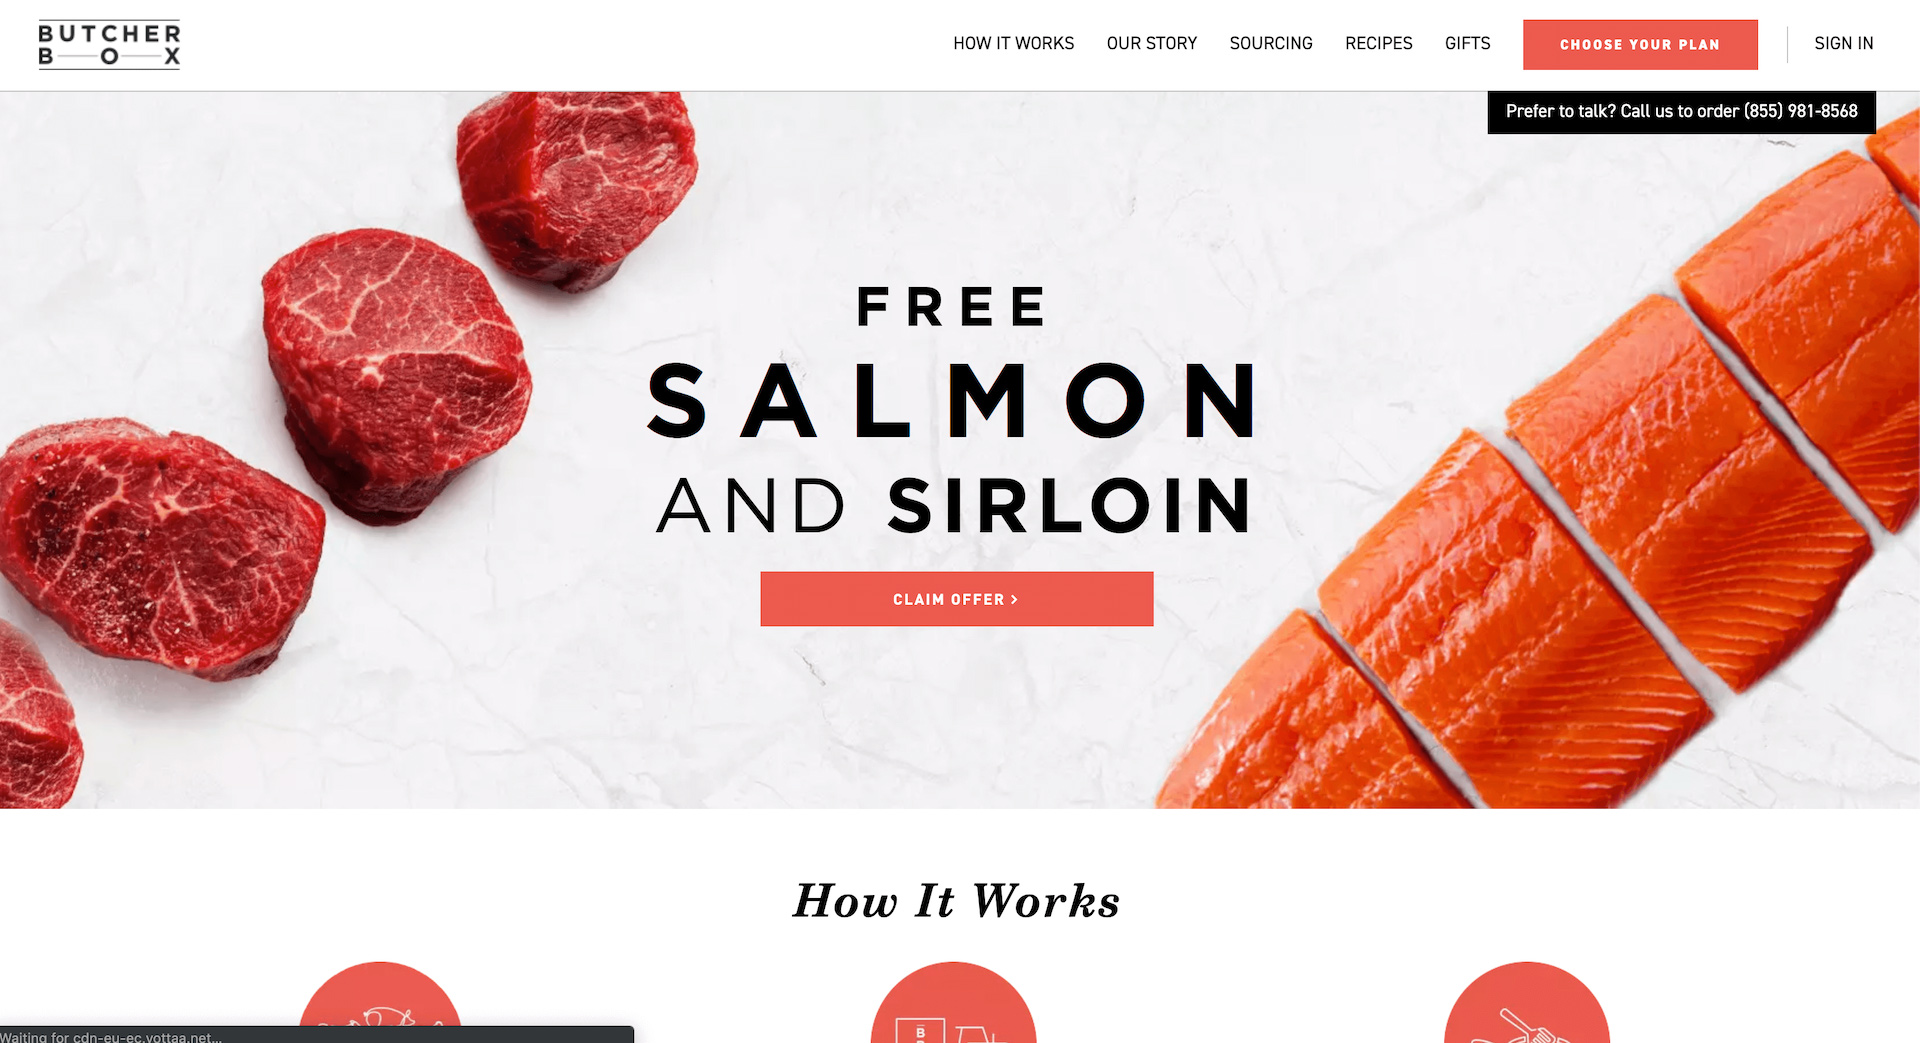 Vendere-carne-online-shopify-(1).jpg